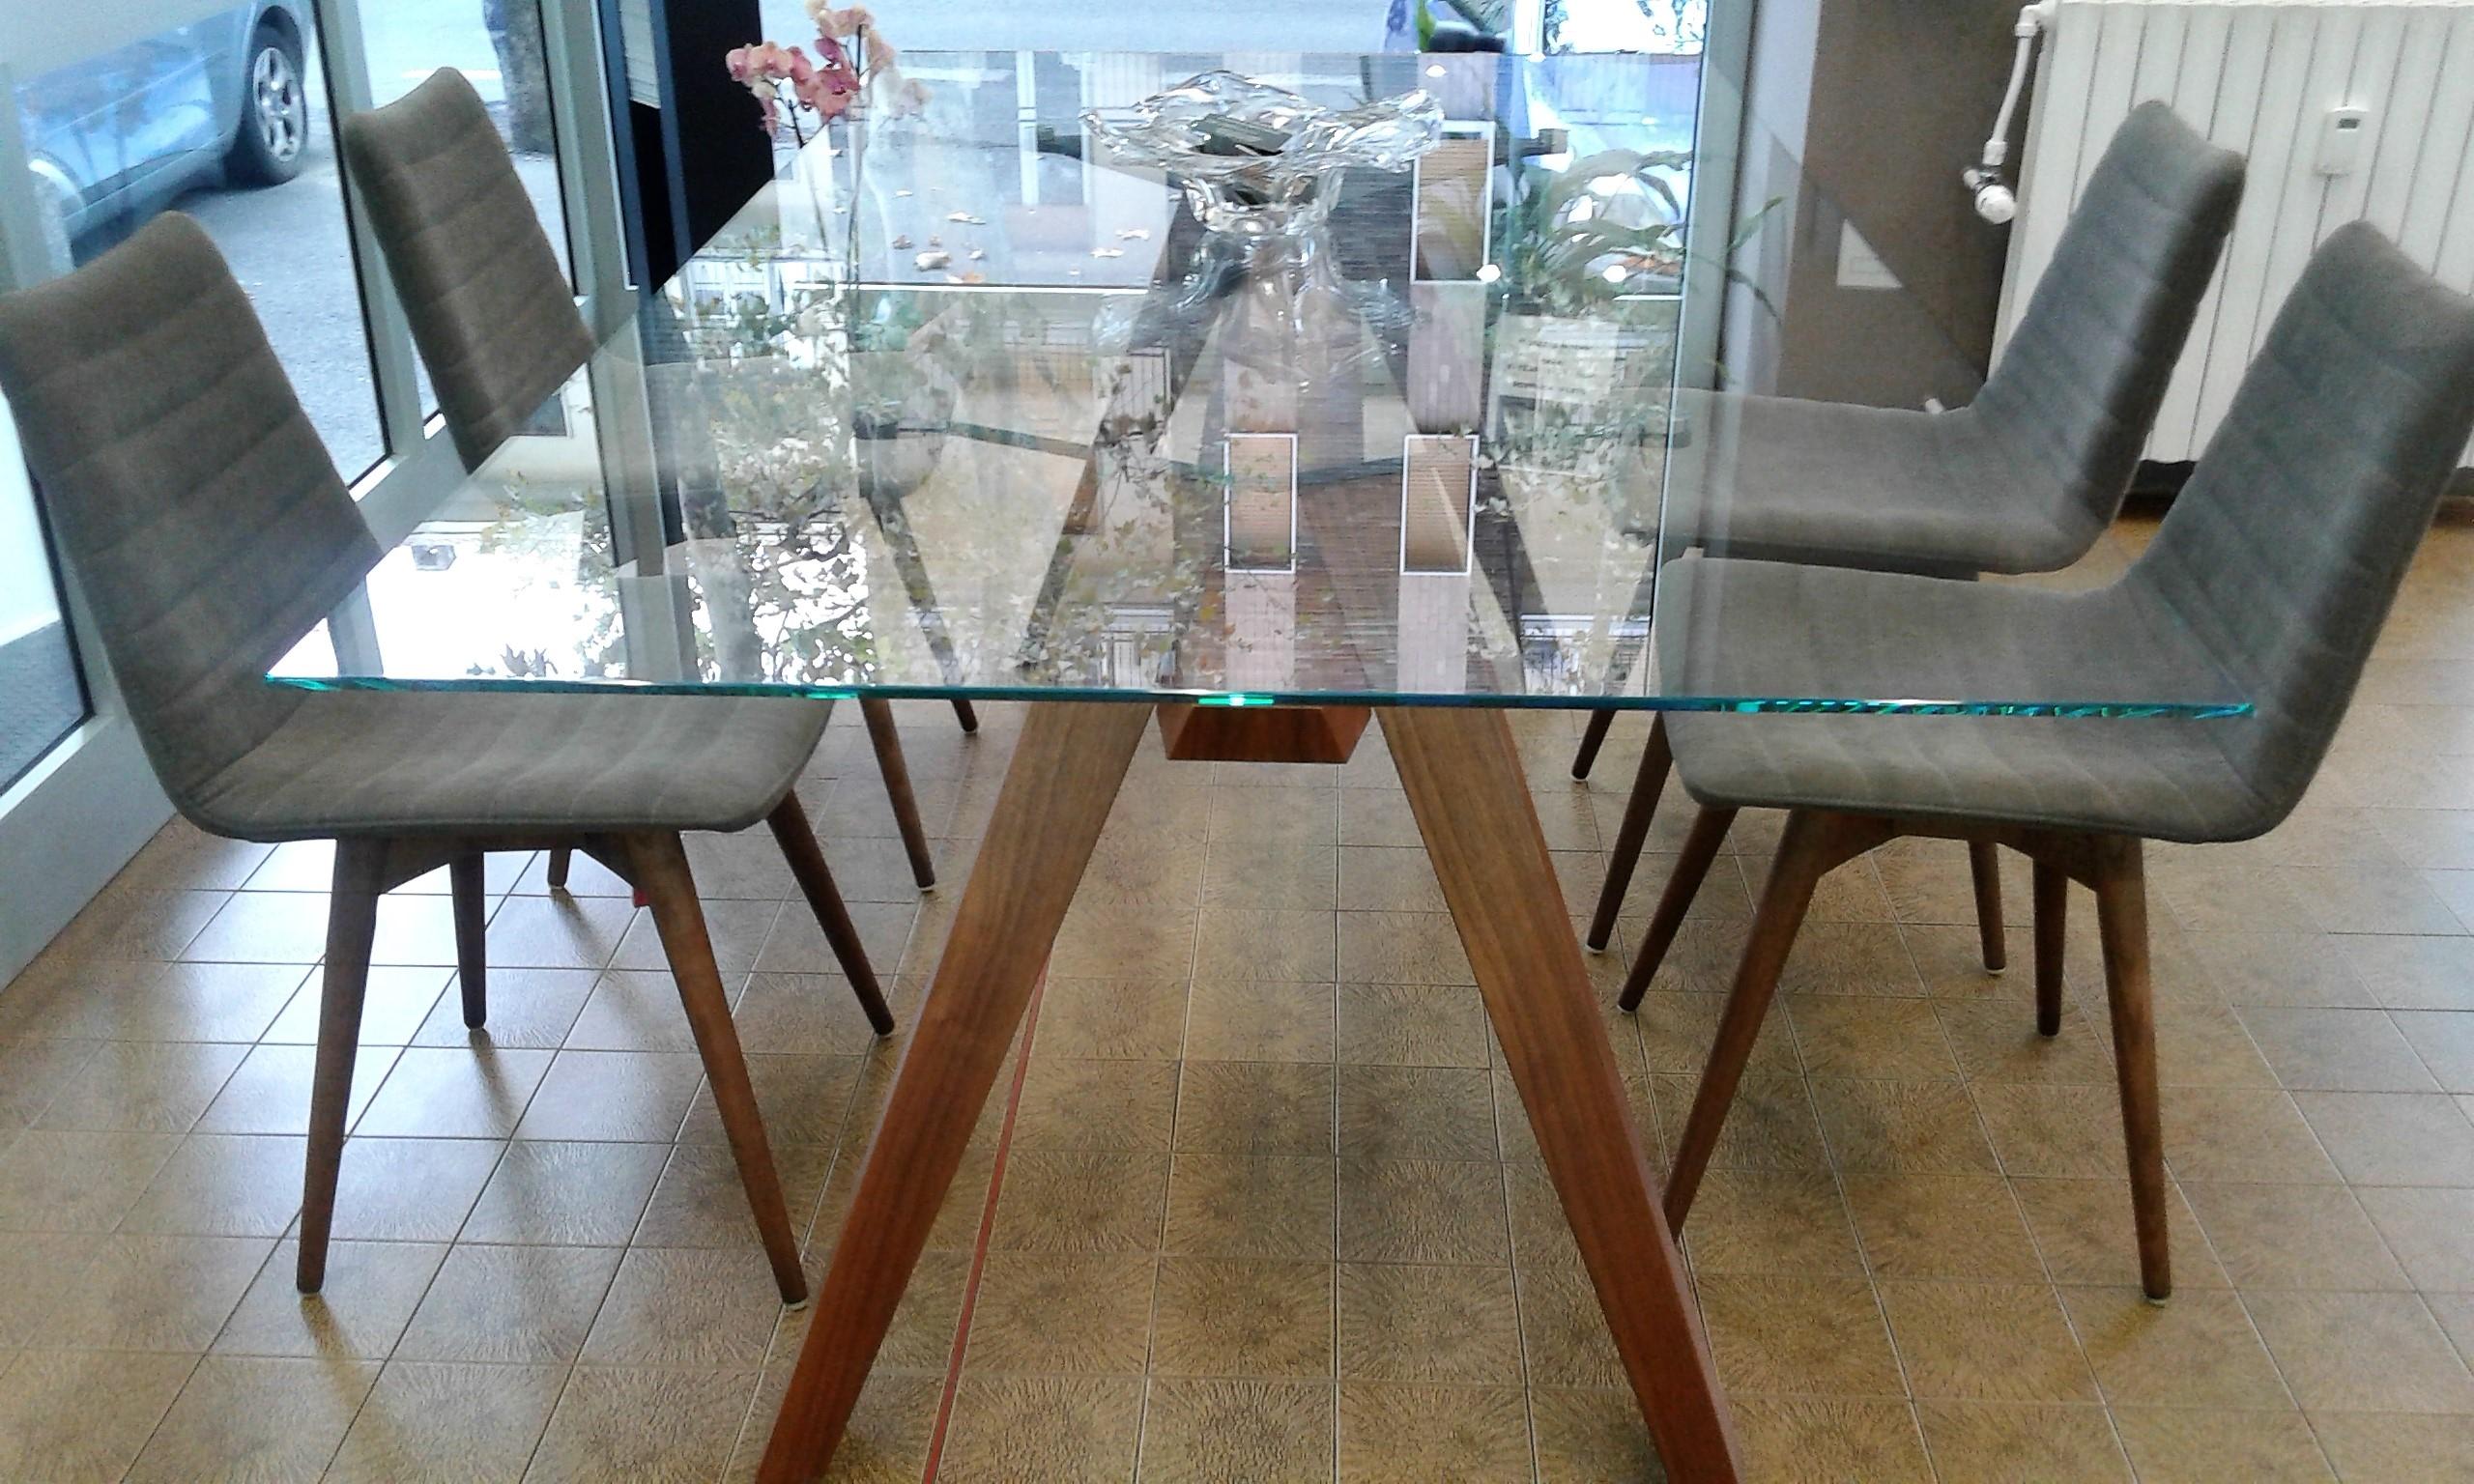 Tavoli Pavia: Offerte Online a Prezzi Scontati